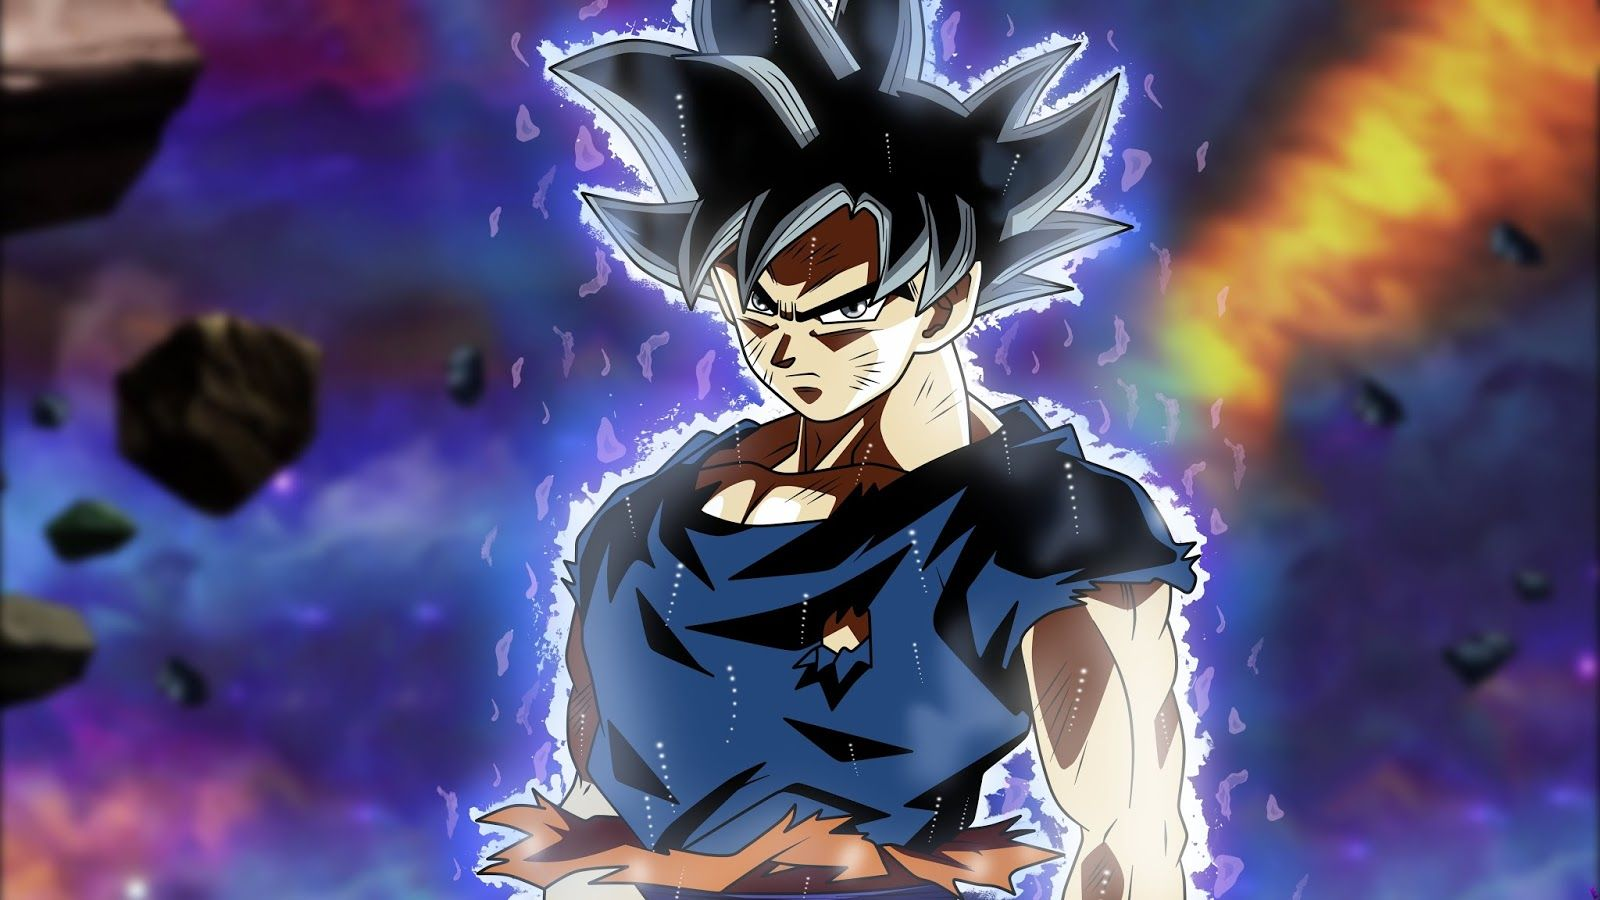 Dragon Ball Super Son Goku Ultra Instinct Dragon Ball 4k Wallpaper Hdwallpaper Desktop Dragon Ball Super Dragon Ball Dragon Ball Goku